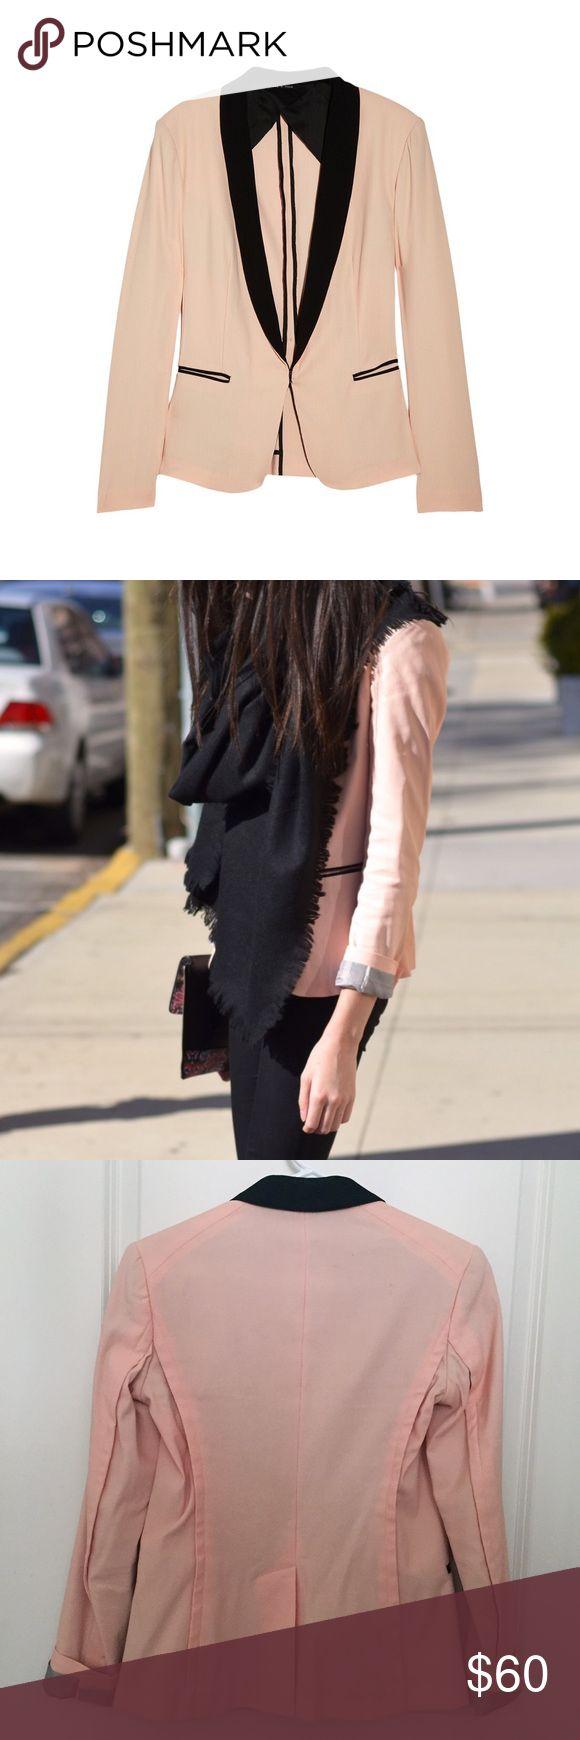 rag & bone peach blazer Peach cotton-blend pique blazer with black lapel and trims. Hook fastening and the front. Striped sleeve lining. rag & bone Jackets & Coats Blazers